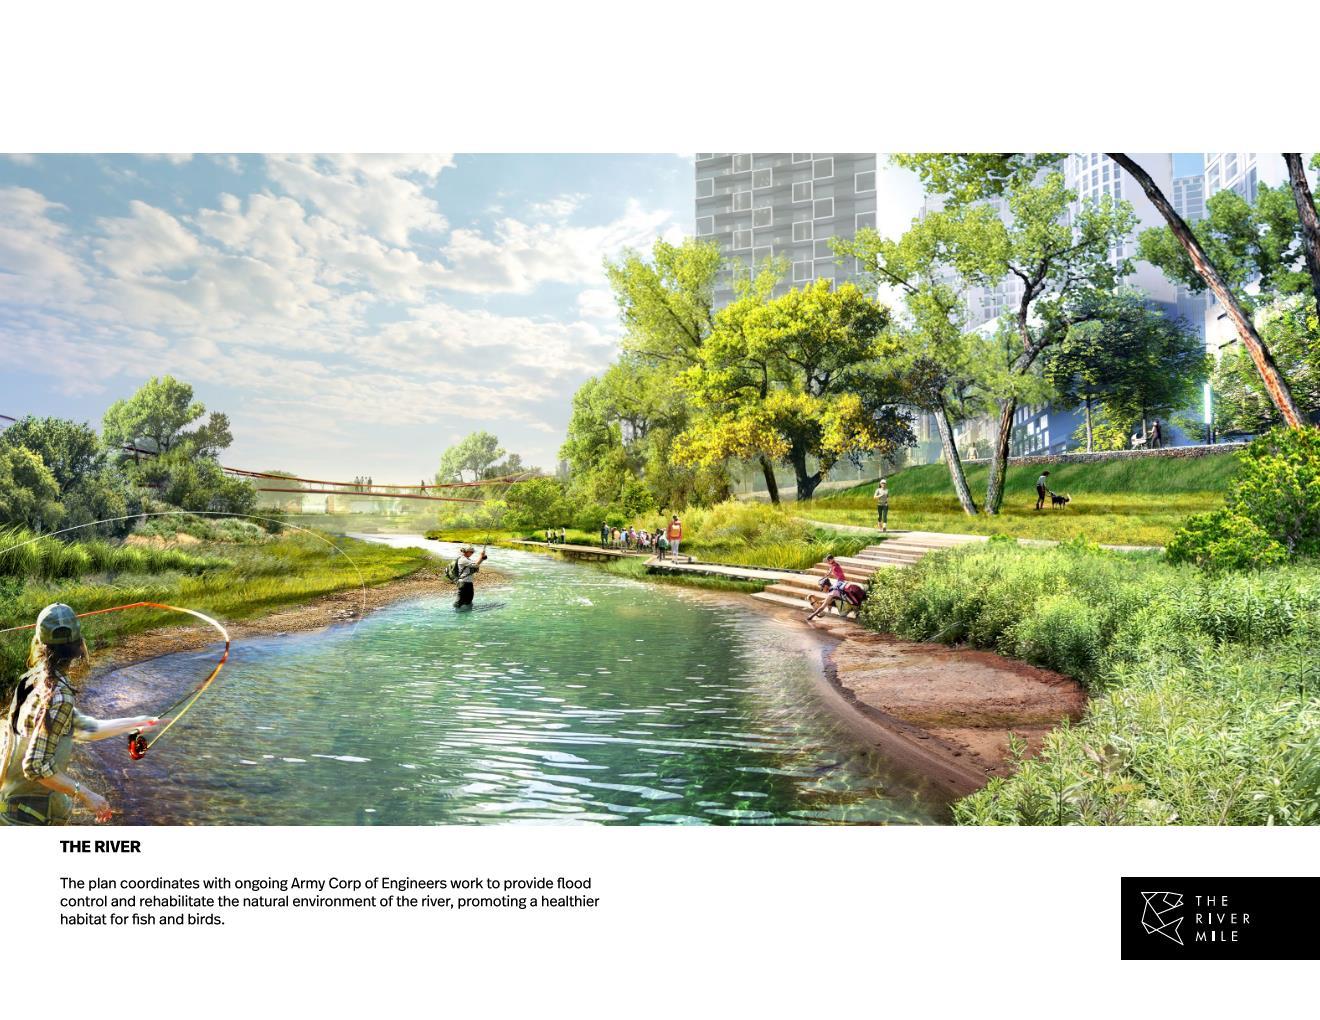 The River Mile - River